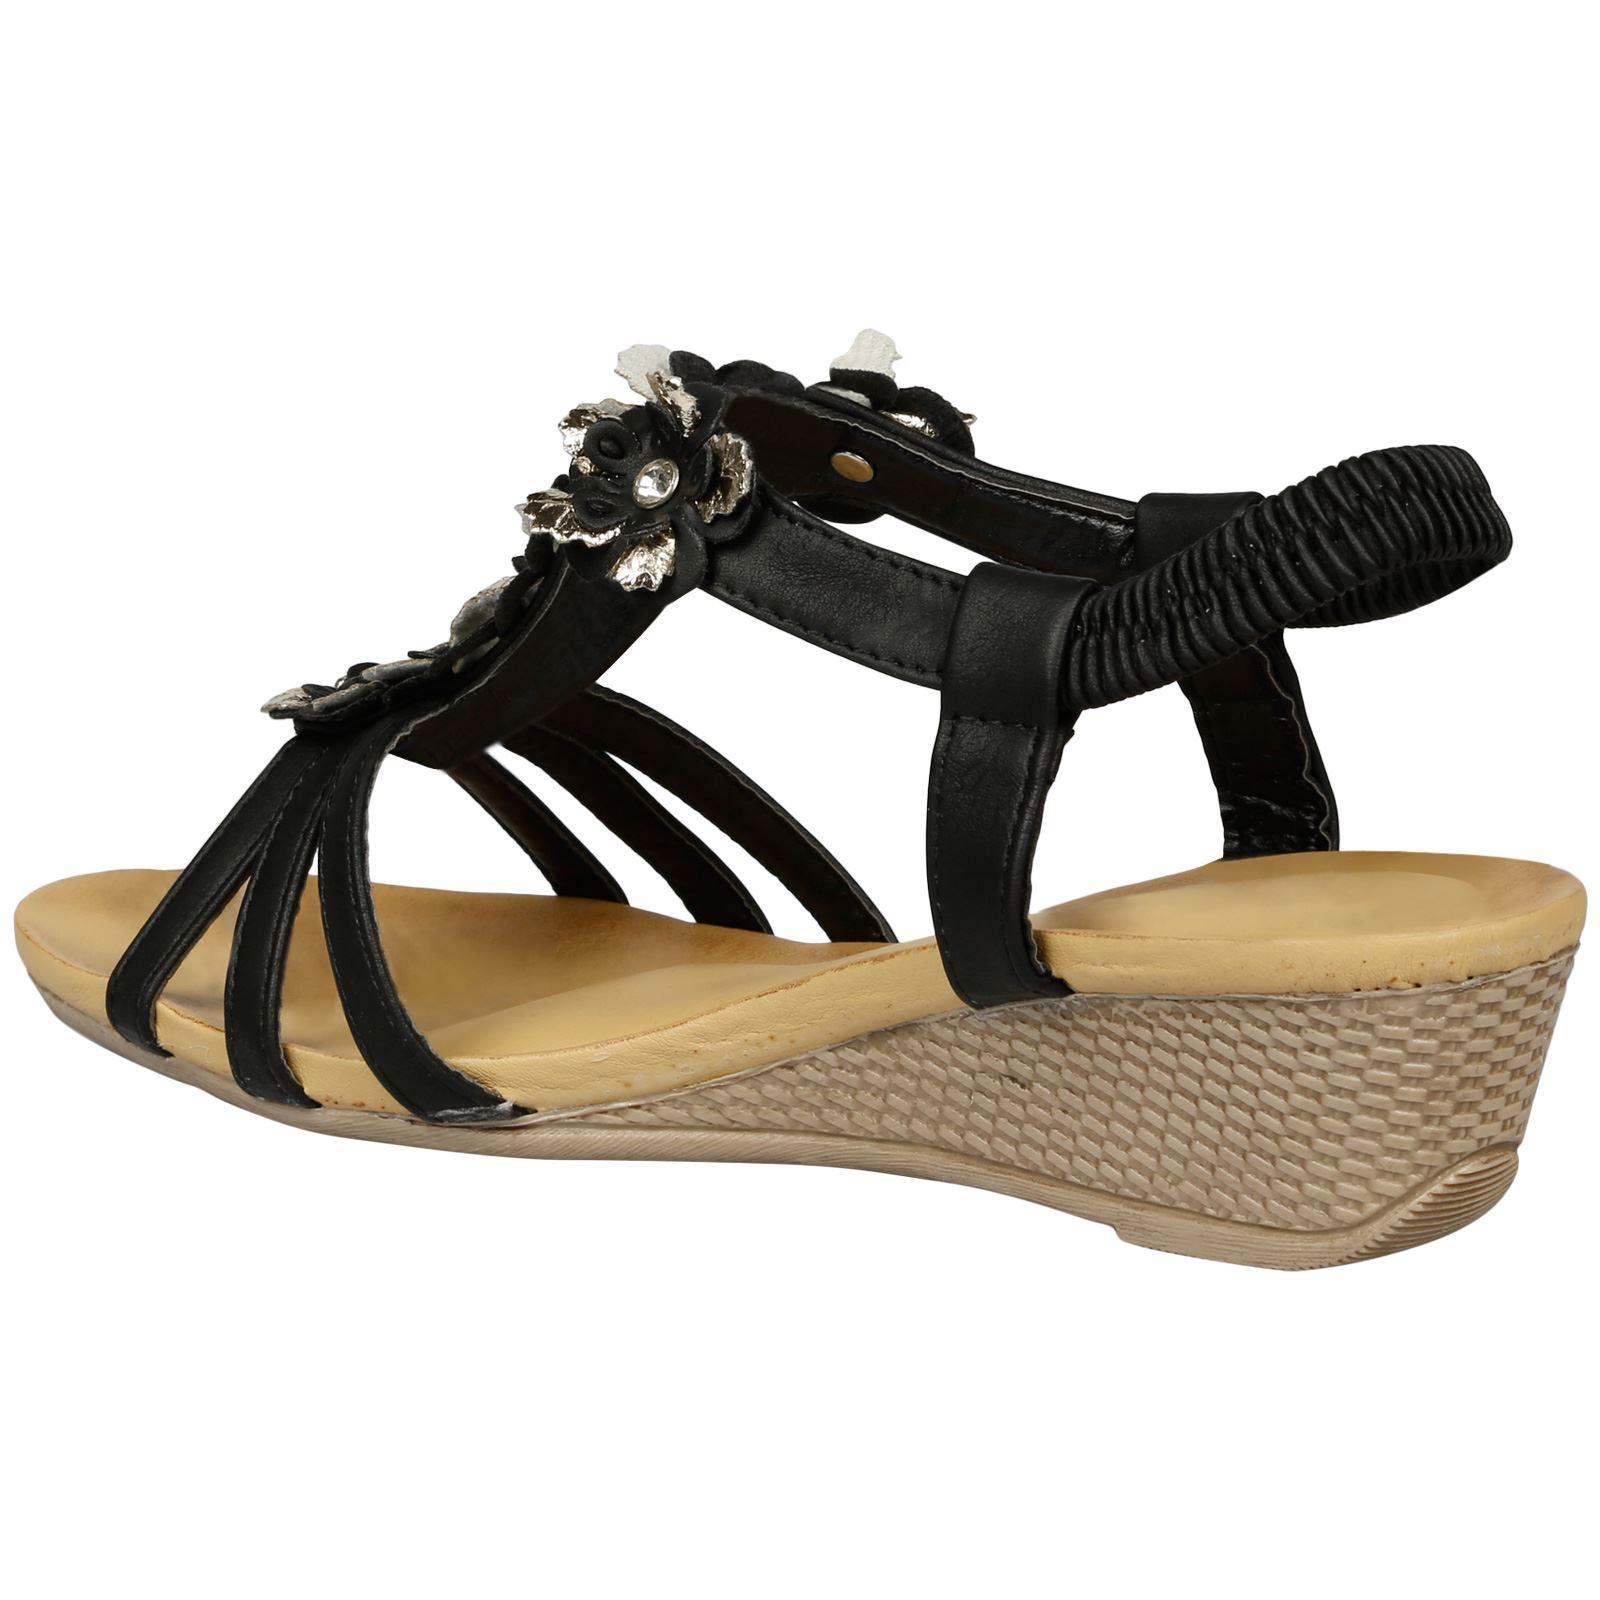 34748a42c Leilani Womens Low Wedges Heels Floral T Bar Sandals Ladies Open Toe ...